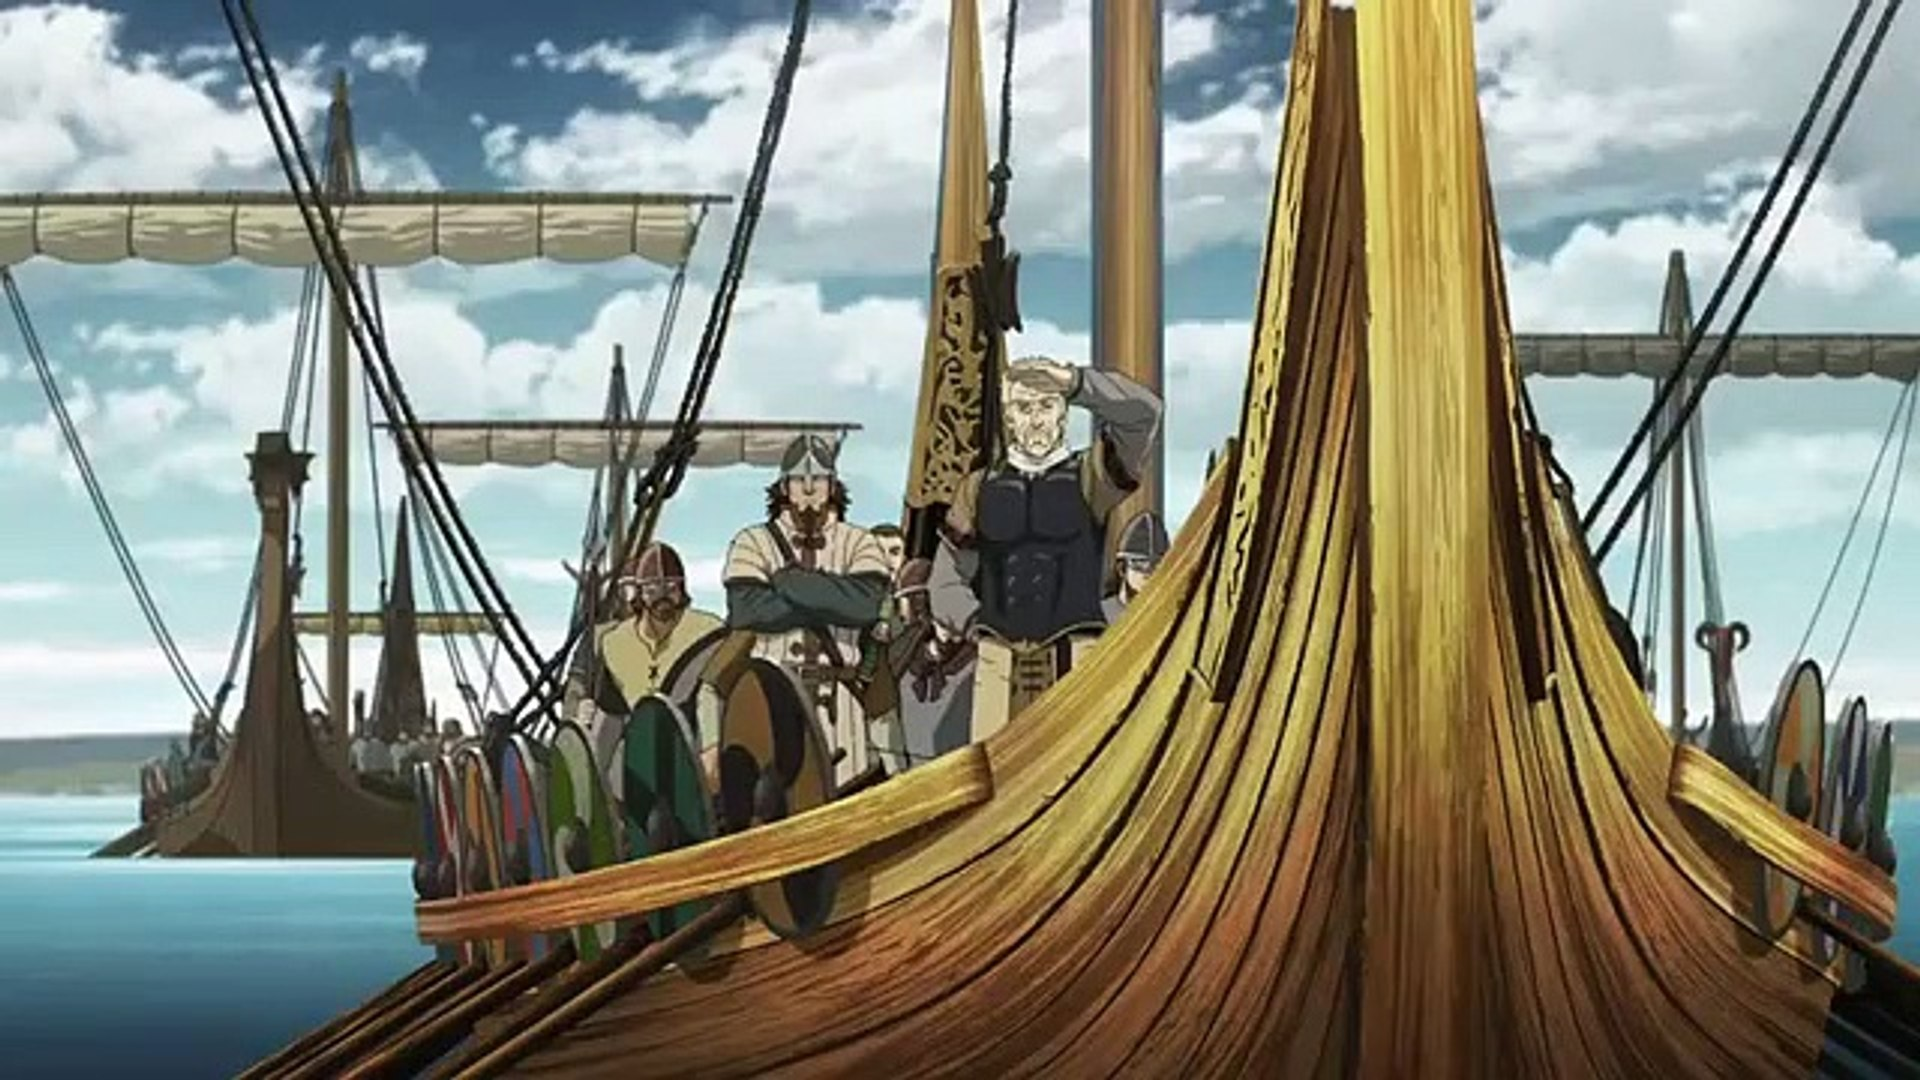 Angel O Demonio S01E01 Cda vinland saga ep 9 vostfr - dowload anime wallpaper hd